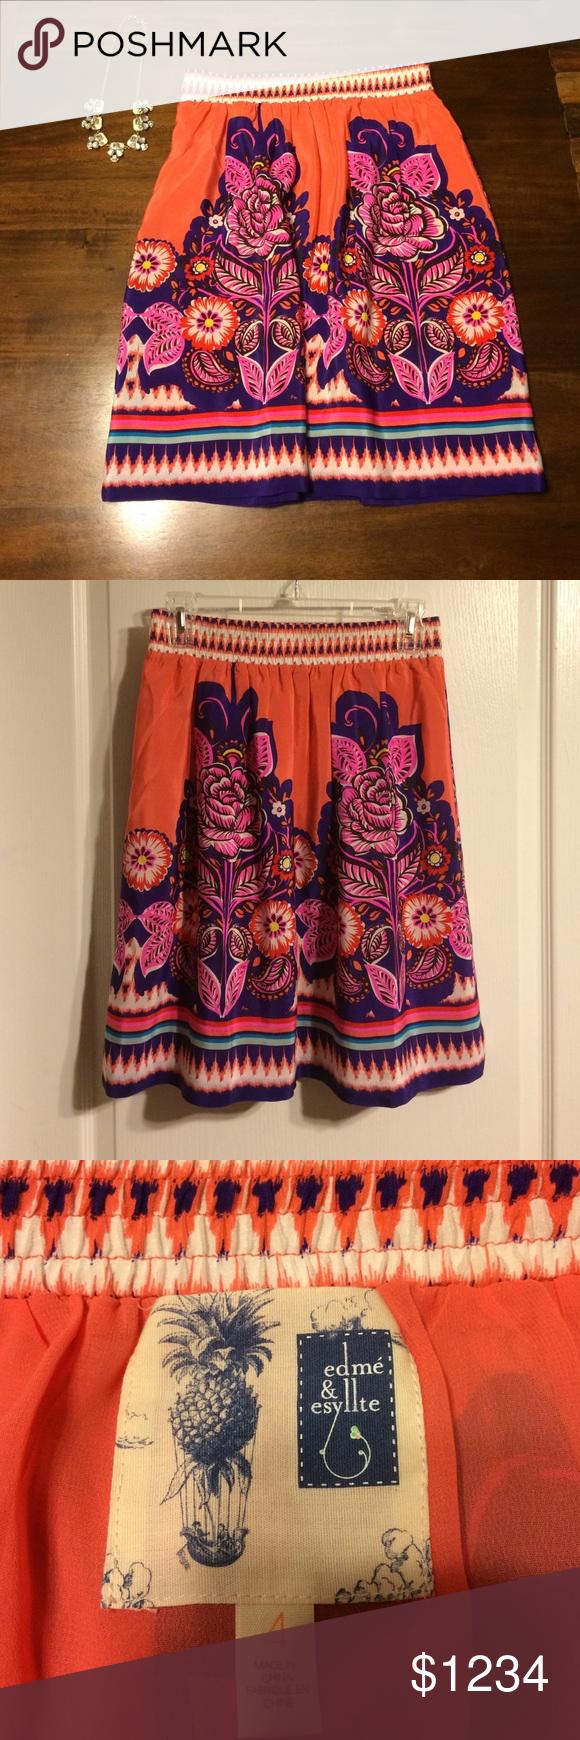 🆕listing-Edme' & Esyllte skirt-LOWEST 🆕listing-Edme' & Esyllte skirt. 100% silk. Elastic waistband. So beautiful. #849 Anthropologie Skirts Mini